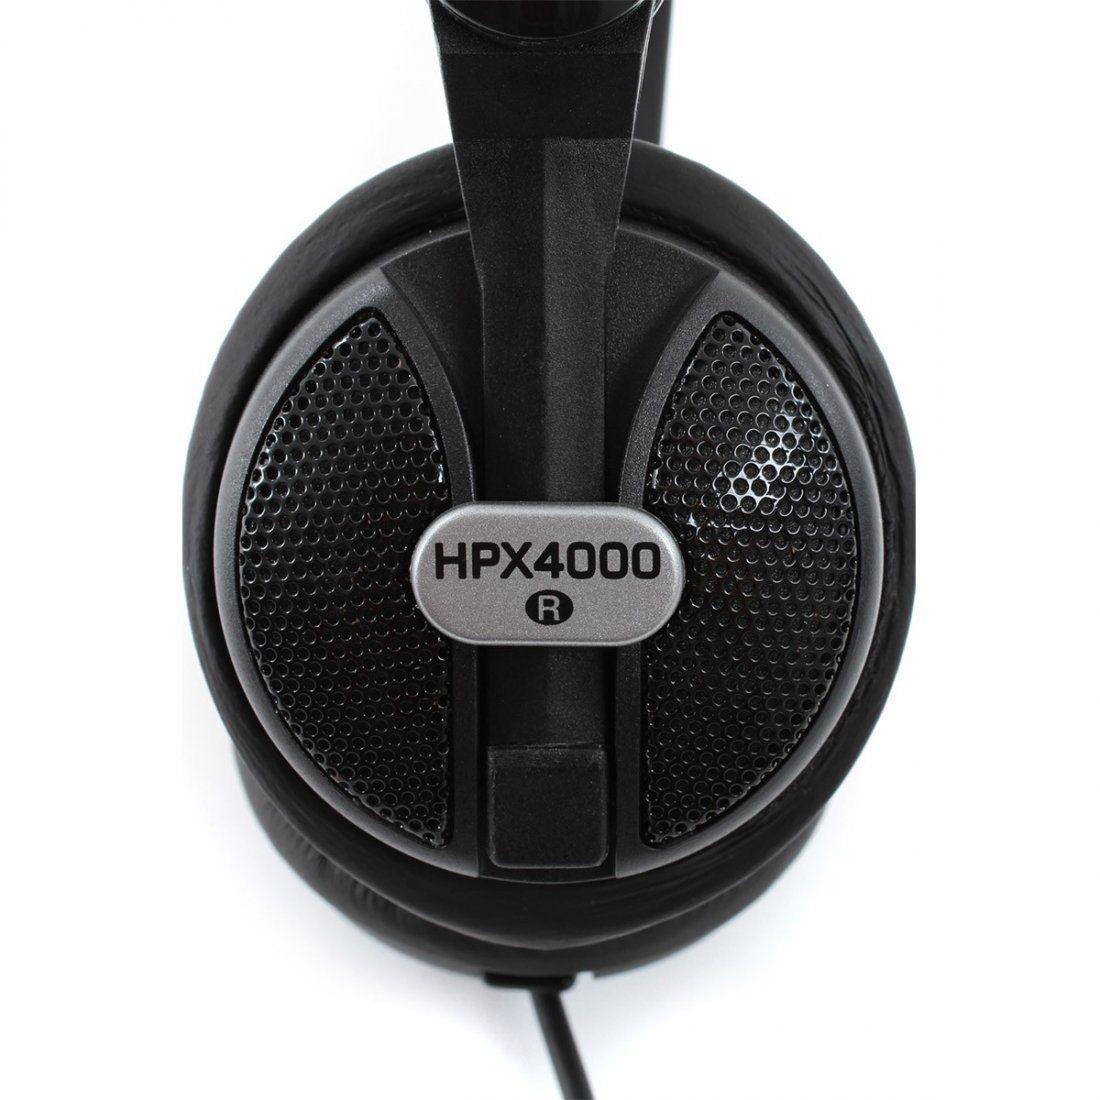 Behringer HPX4000 Fone de Ouvido HPX-4000 Semi- Aberto para Dj Profissional